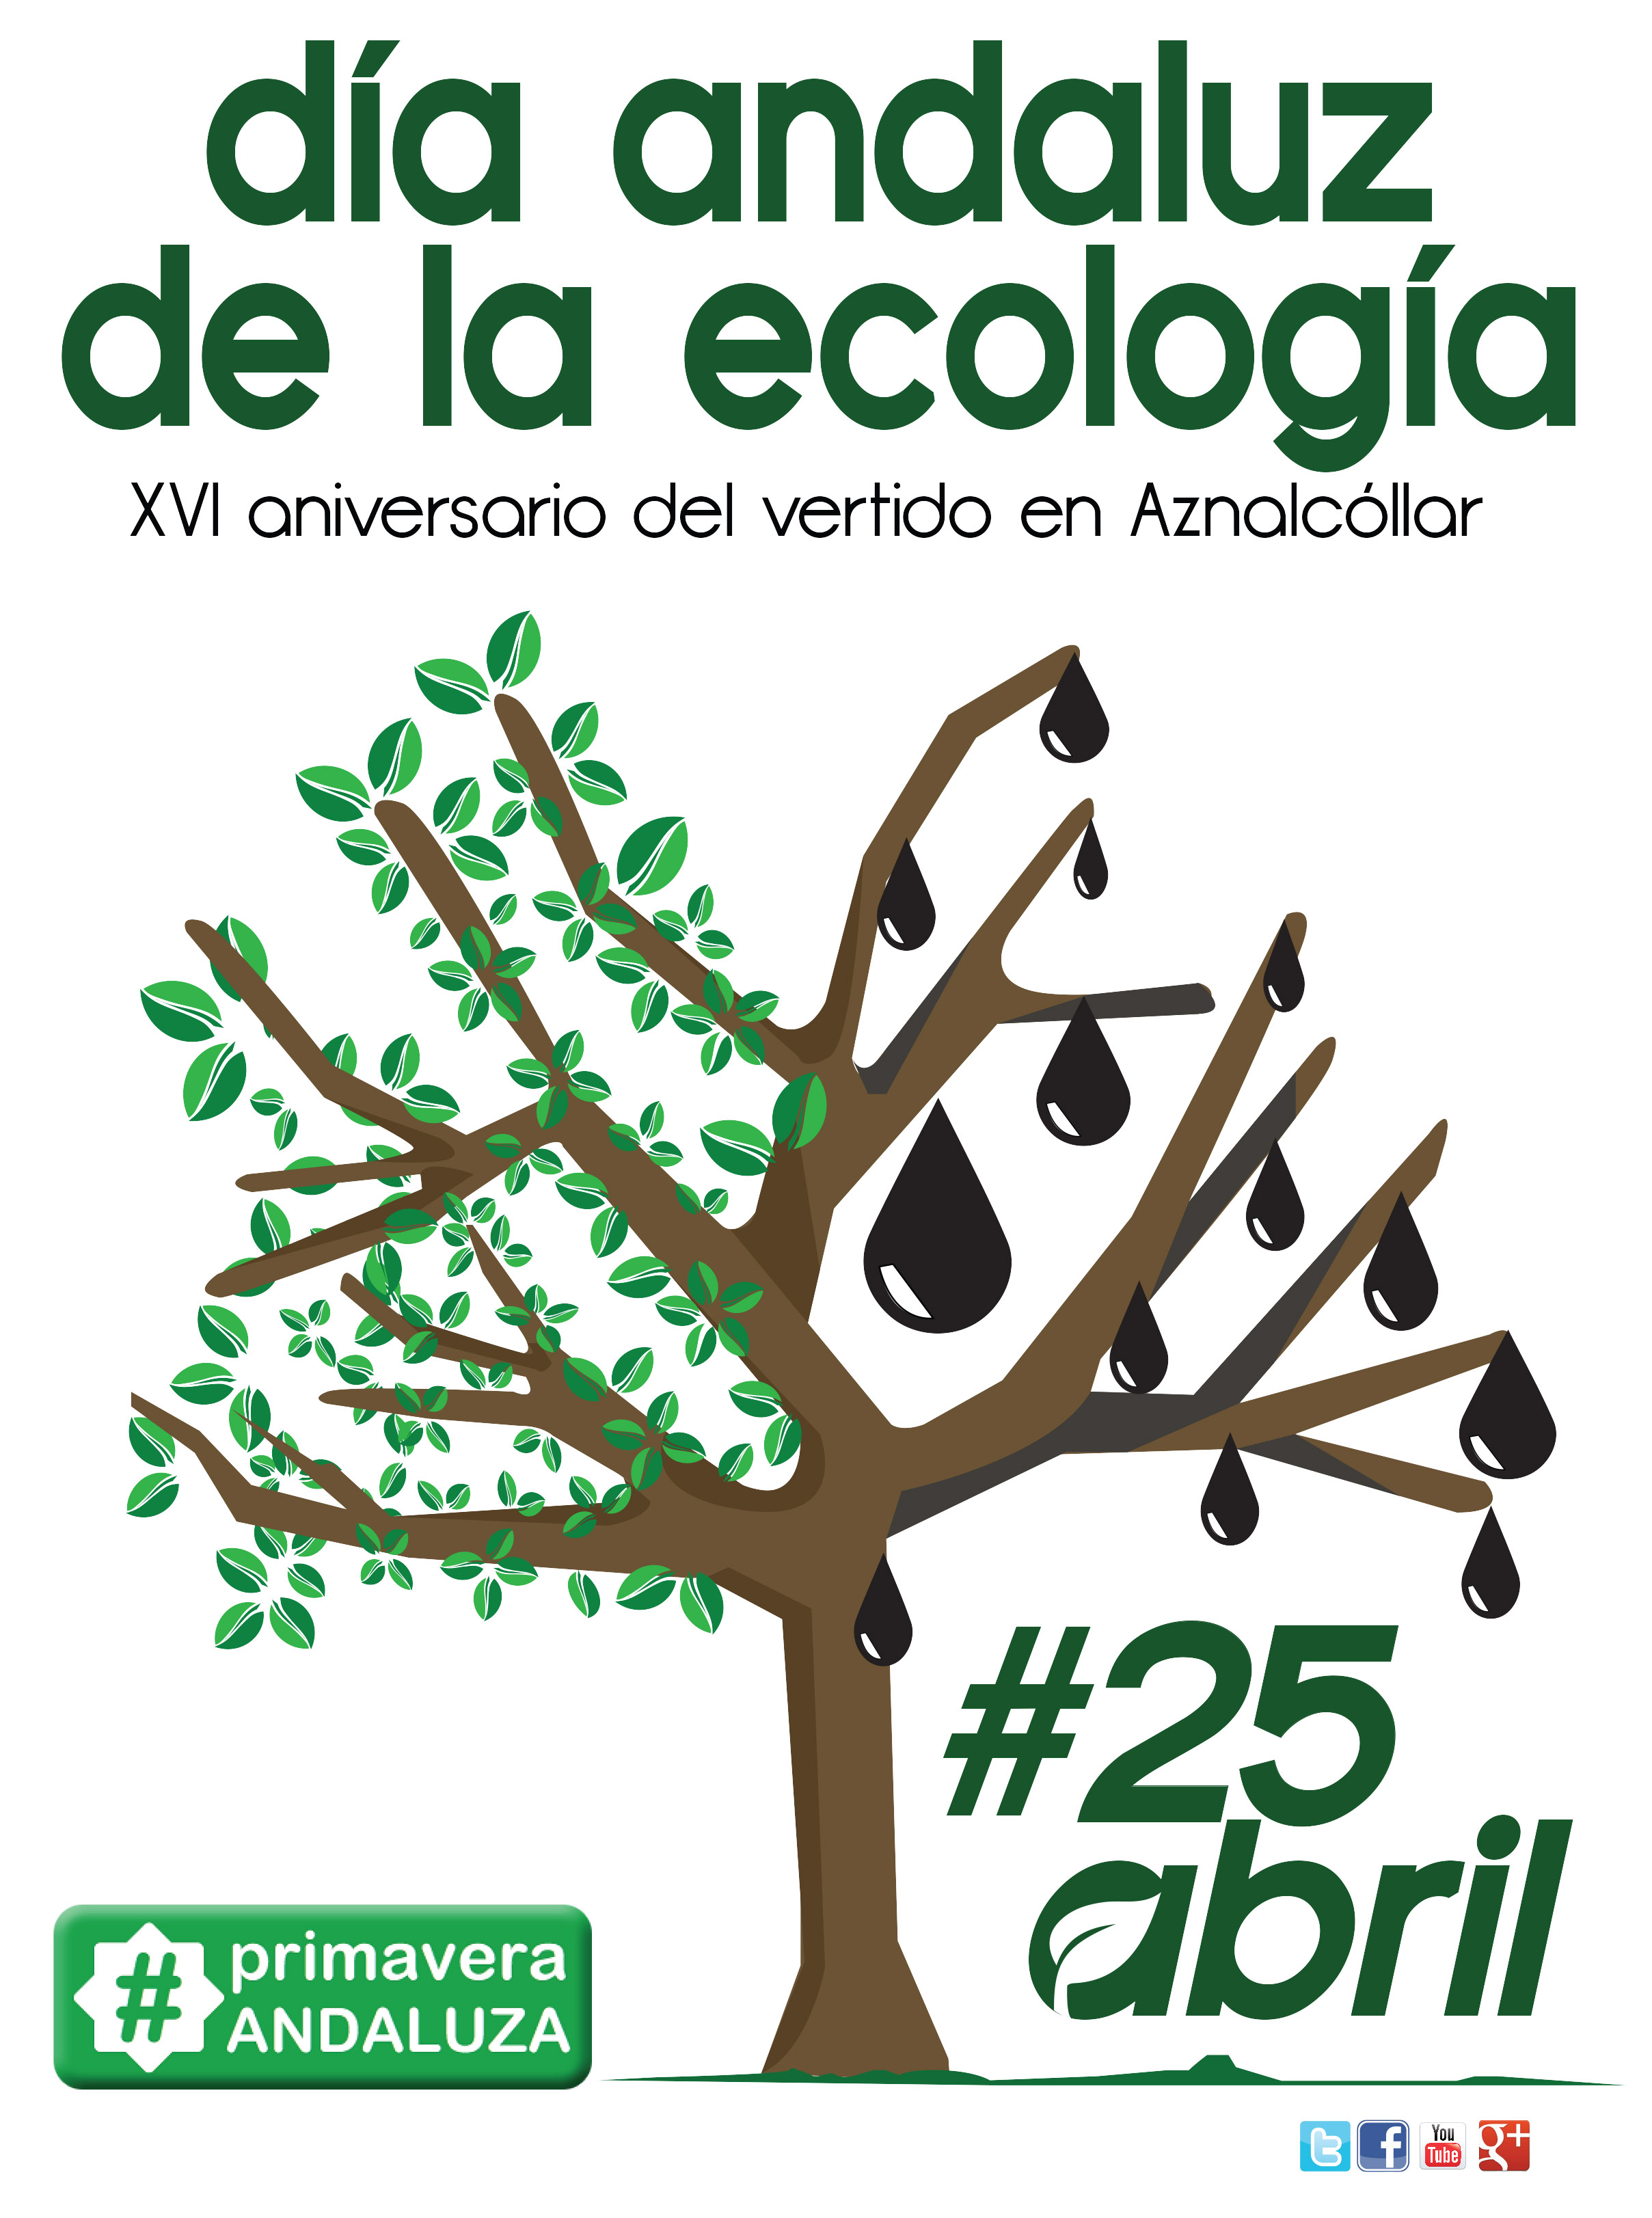 25 abril dia andaluz ecologia cartel